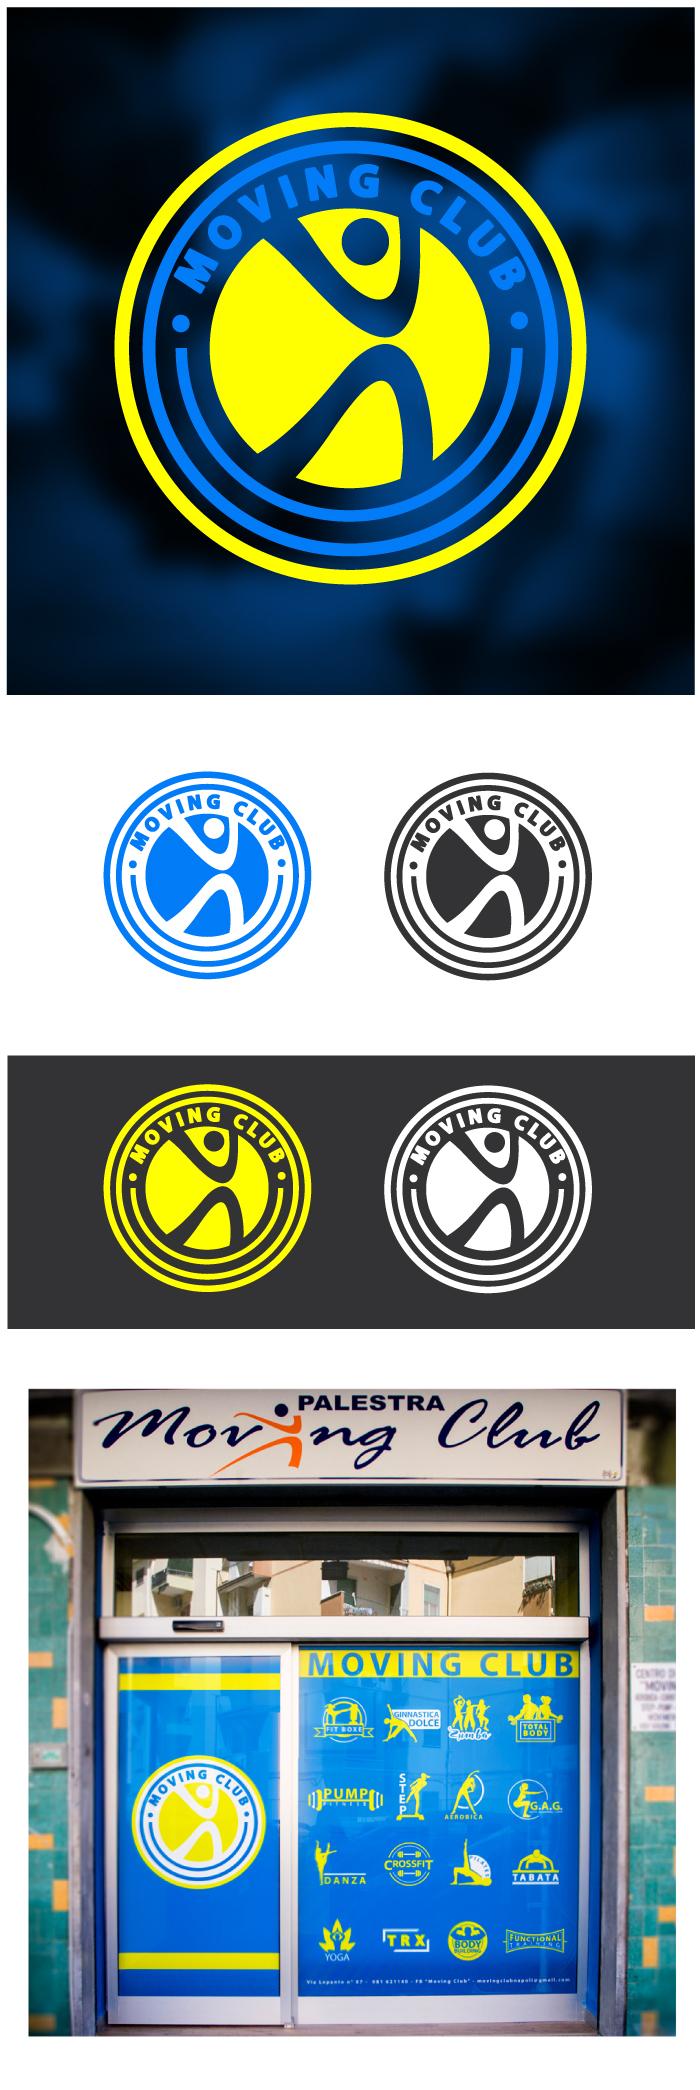 moving club, logo, napoli, Diana Petrarca, graphic design, illustration, web, sport, gym, palestra, Fuorigrotta, graphic designer, illustrator, yellow, giallo, blu, fitness